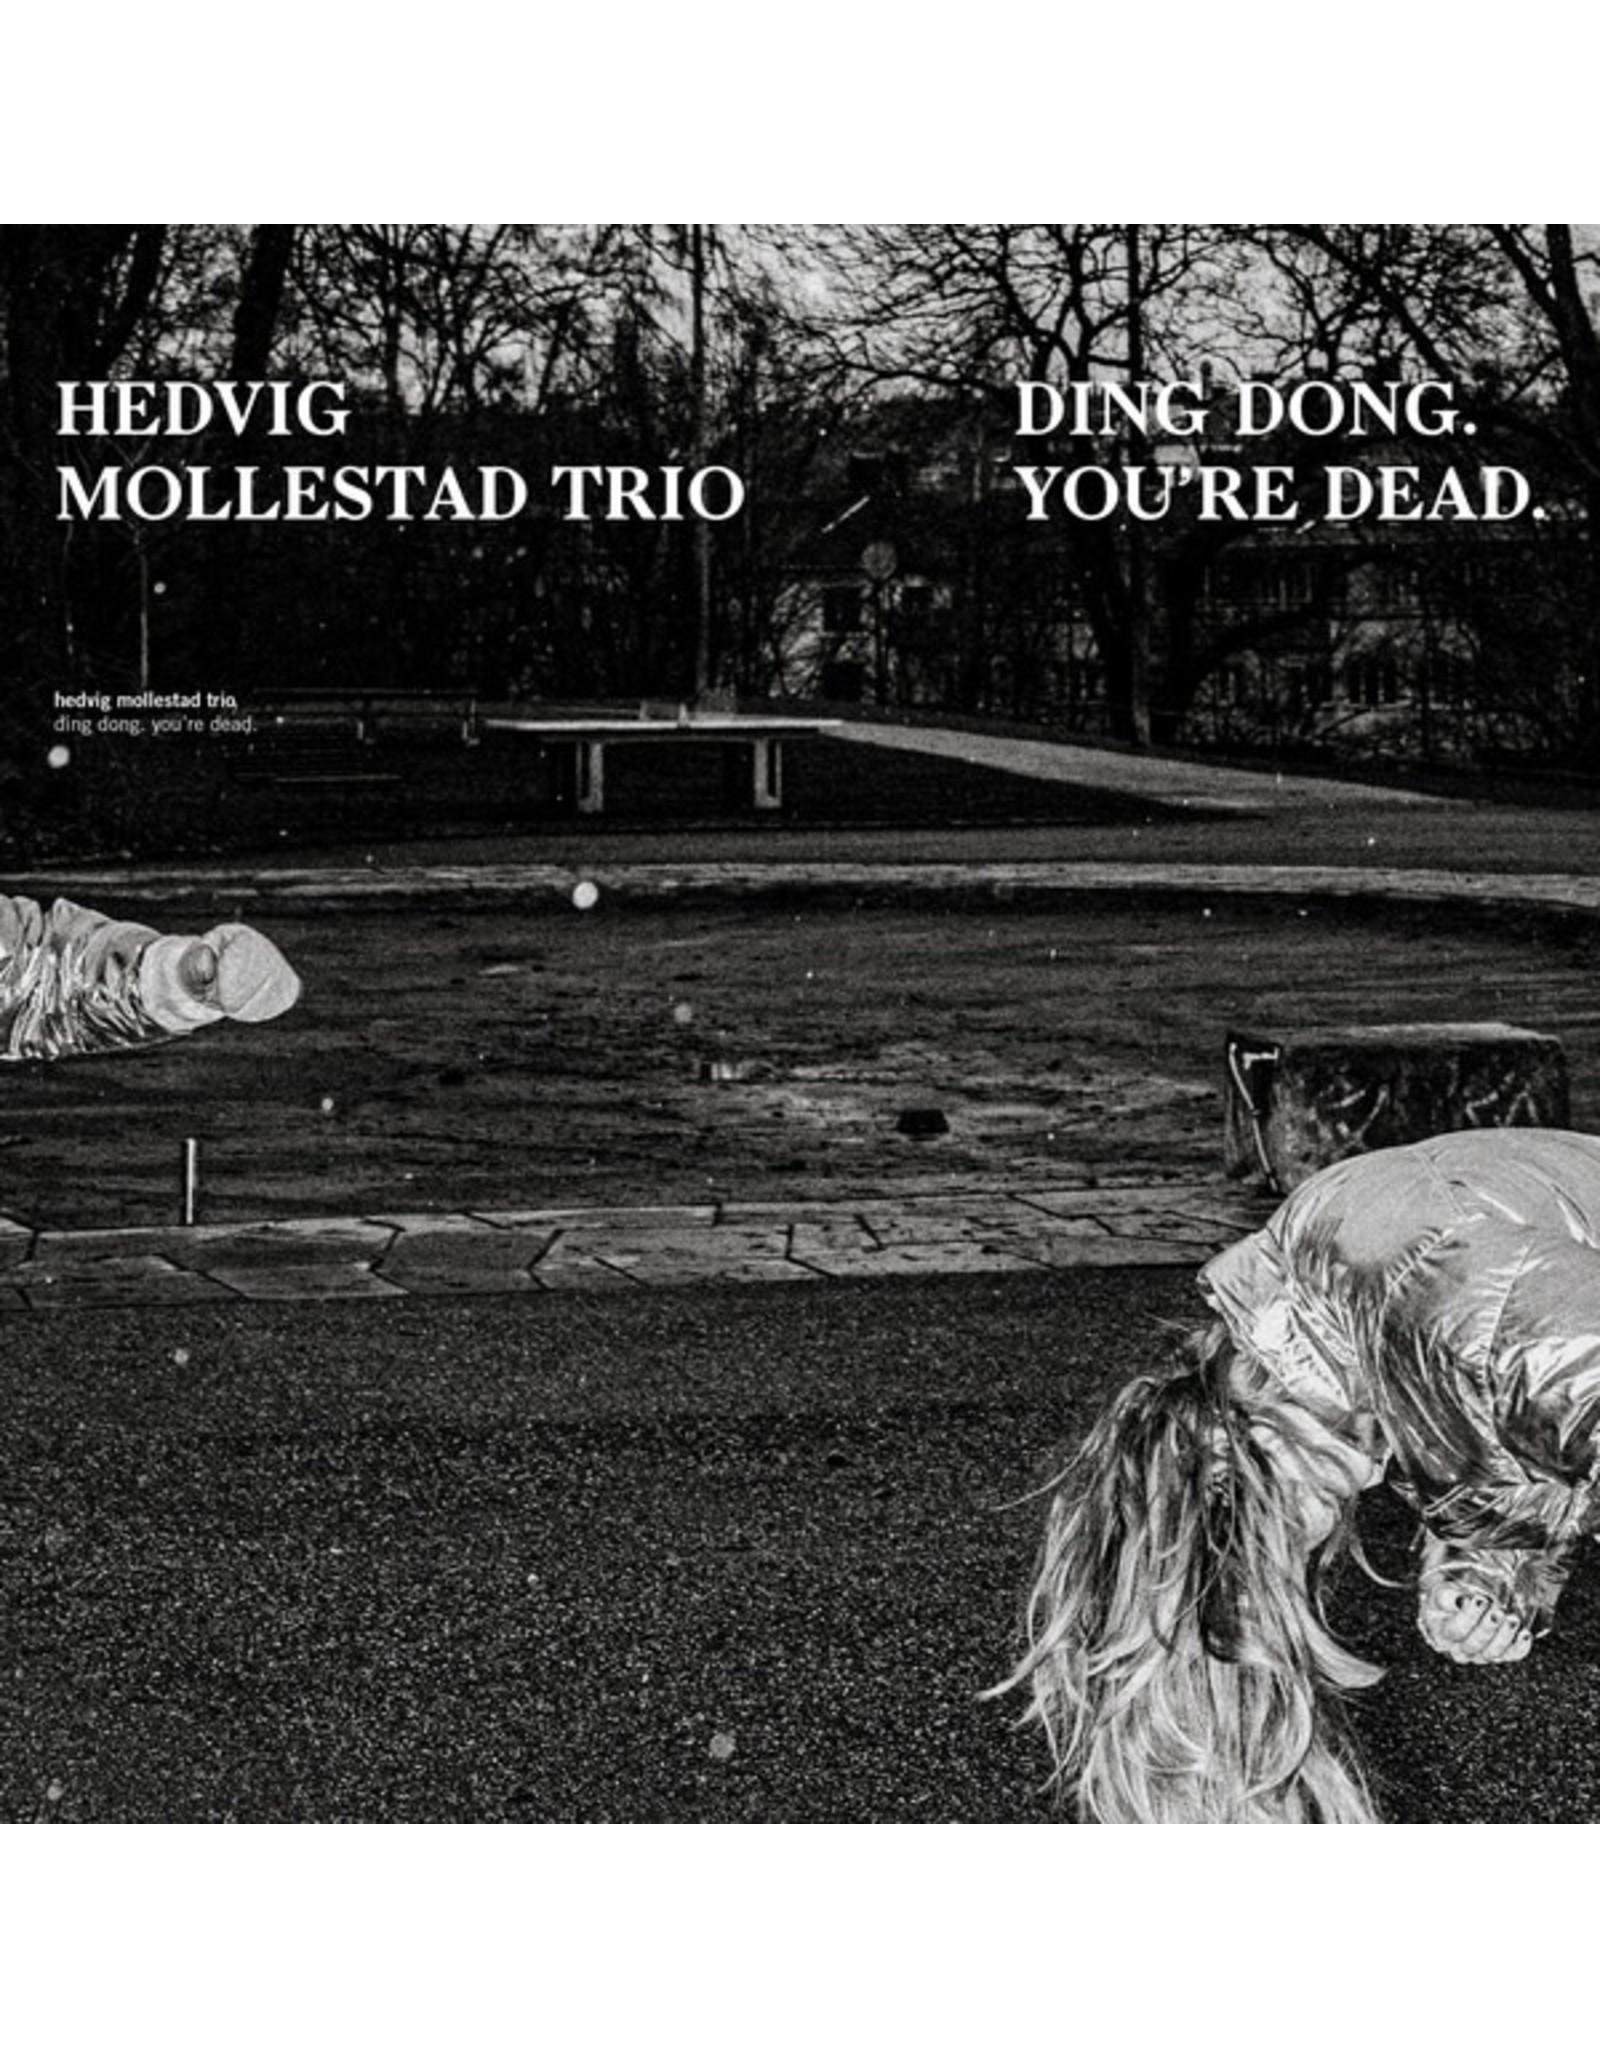 New Vinyl Hedvig Mollestad Trio - Ding Dong. You're Dead. LP